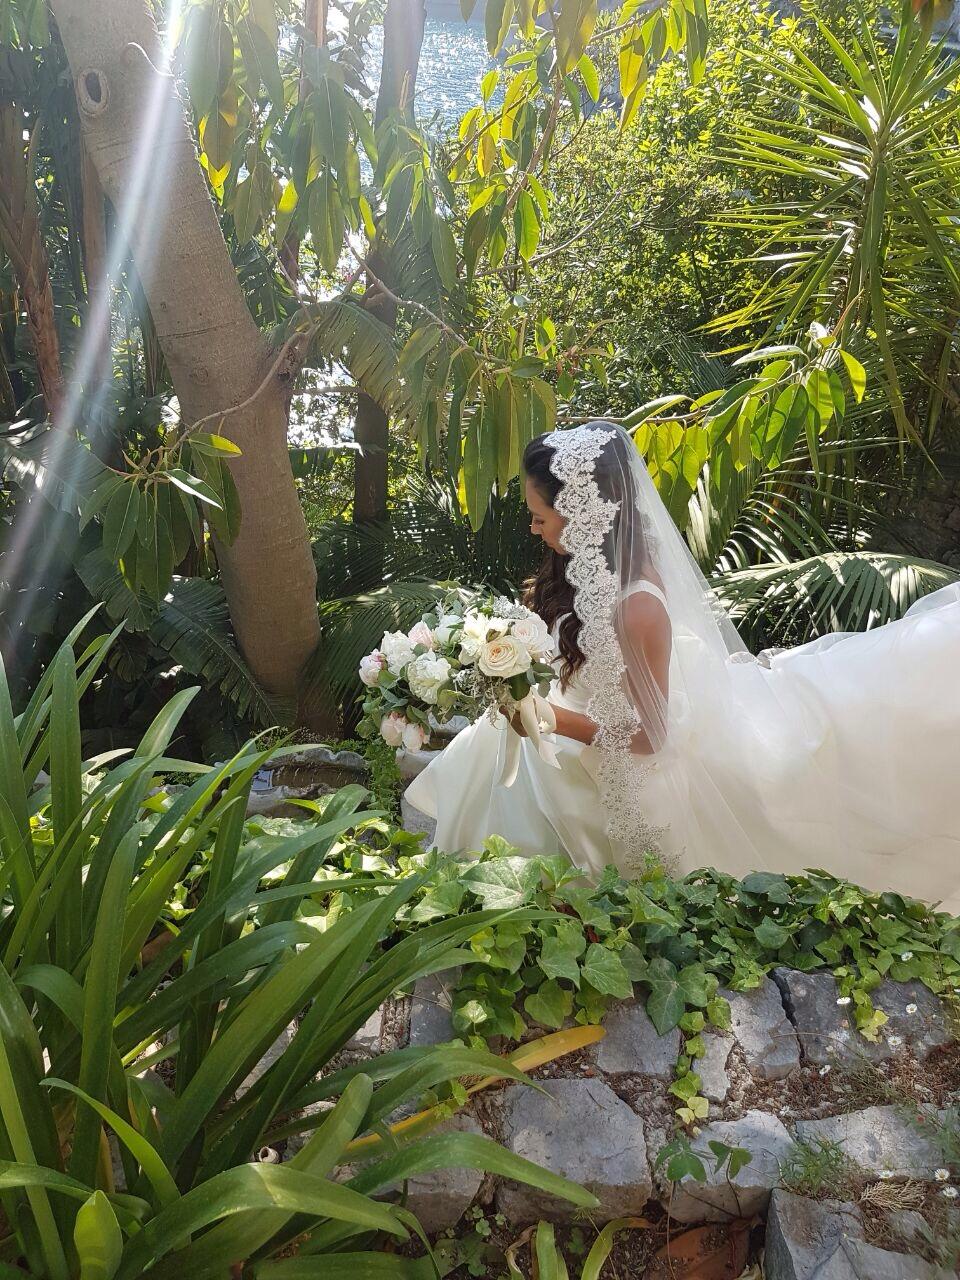 https://www.weddingamalfi.com/wp-content/uploads/Nathalie-and-Benjamin-wedding-day-in-Positano-9.jpg